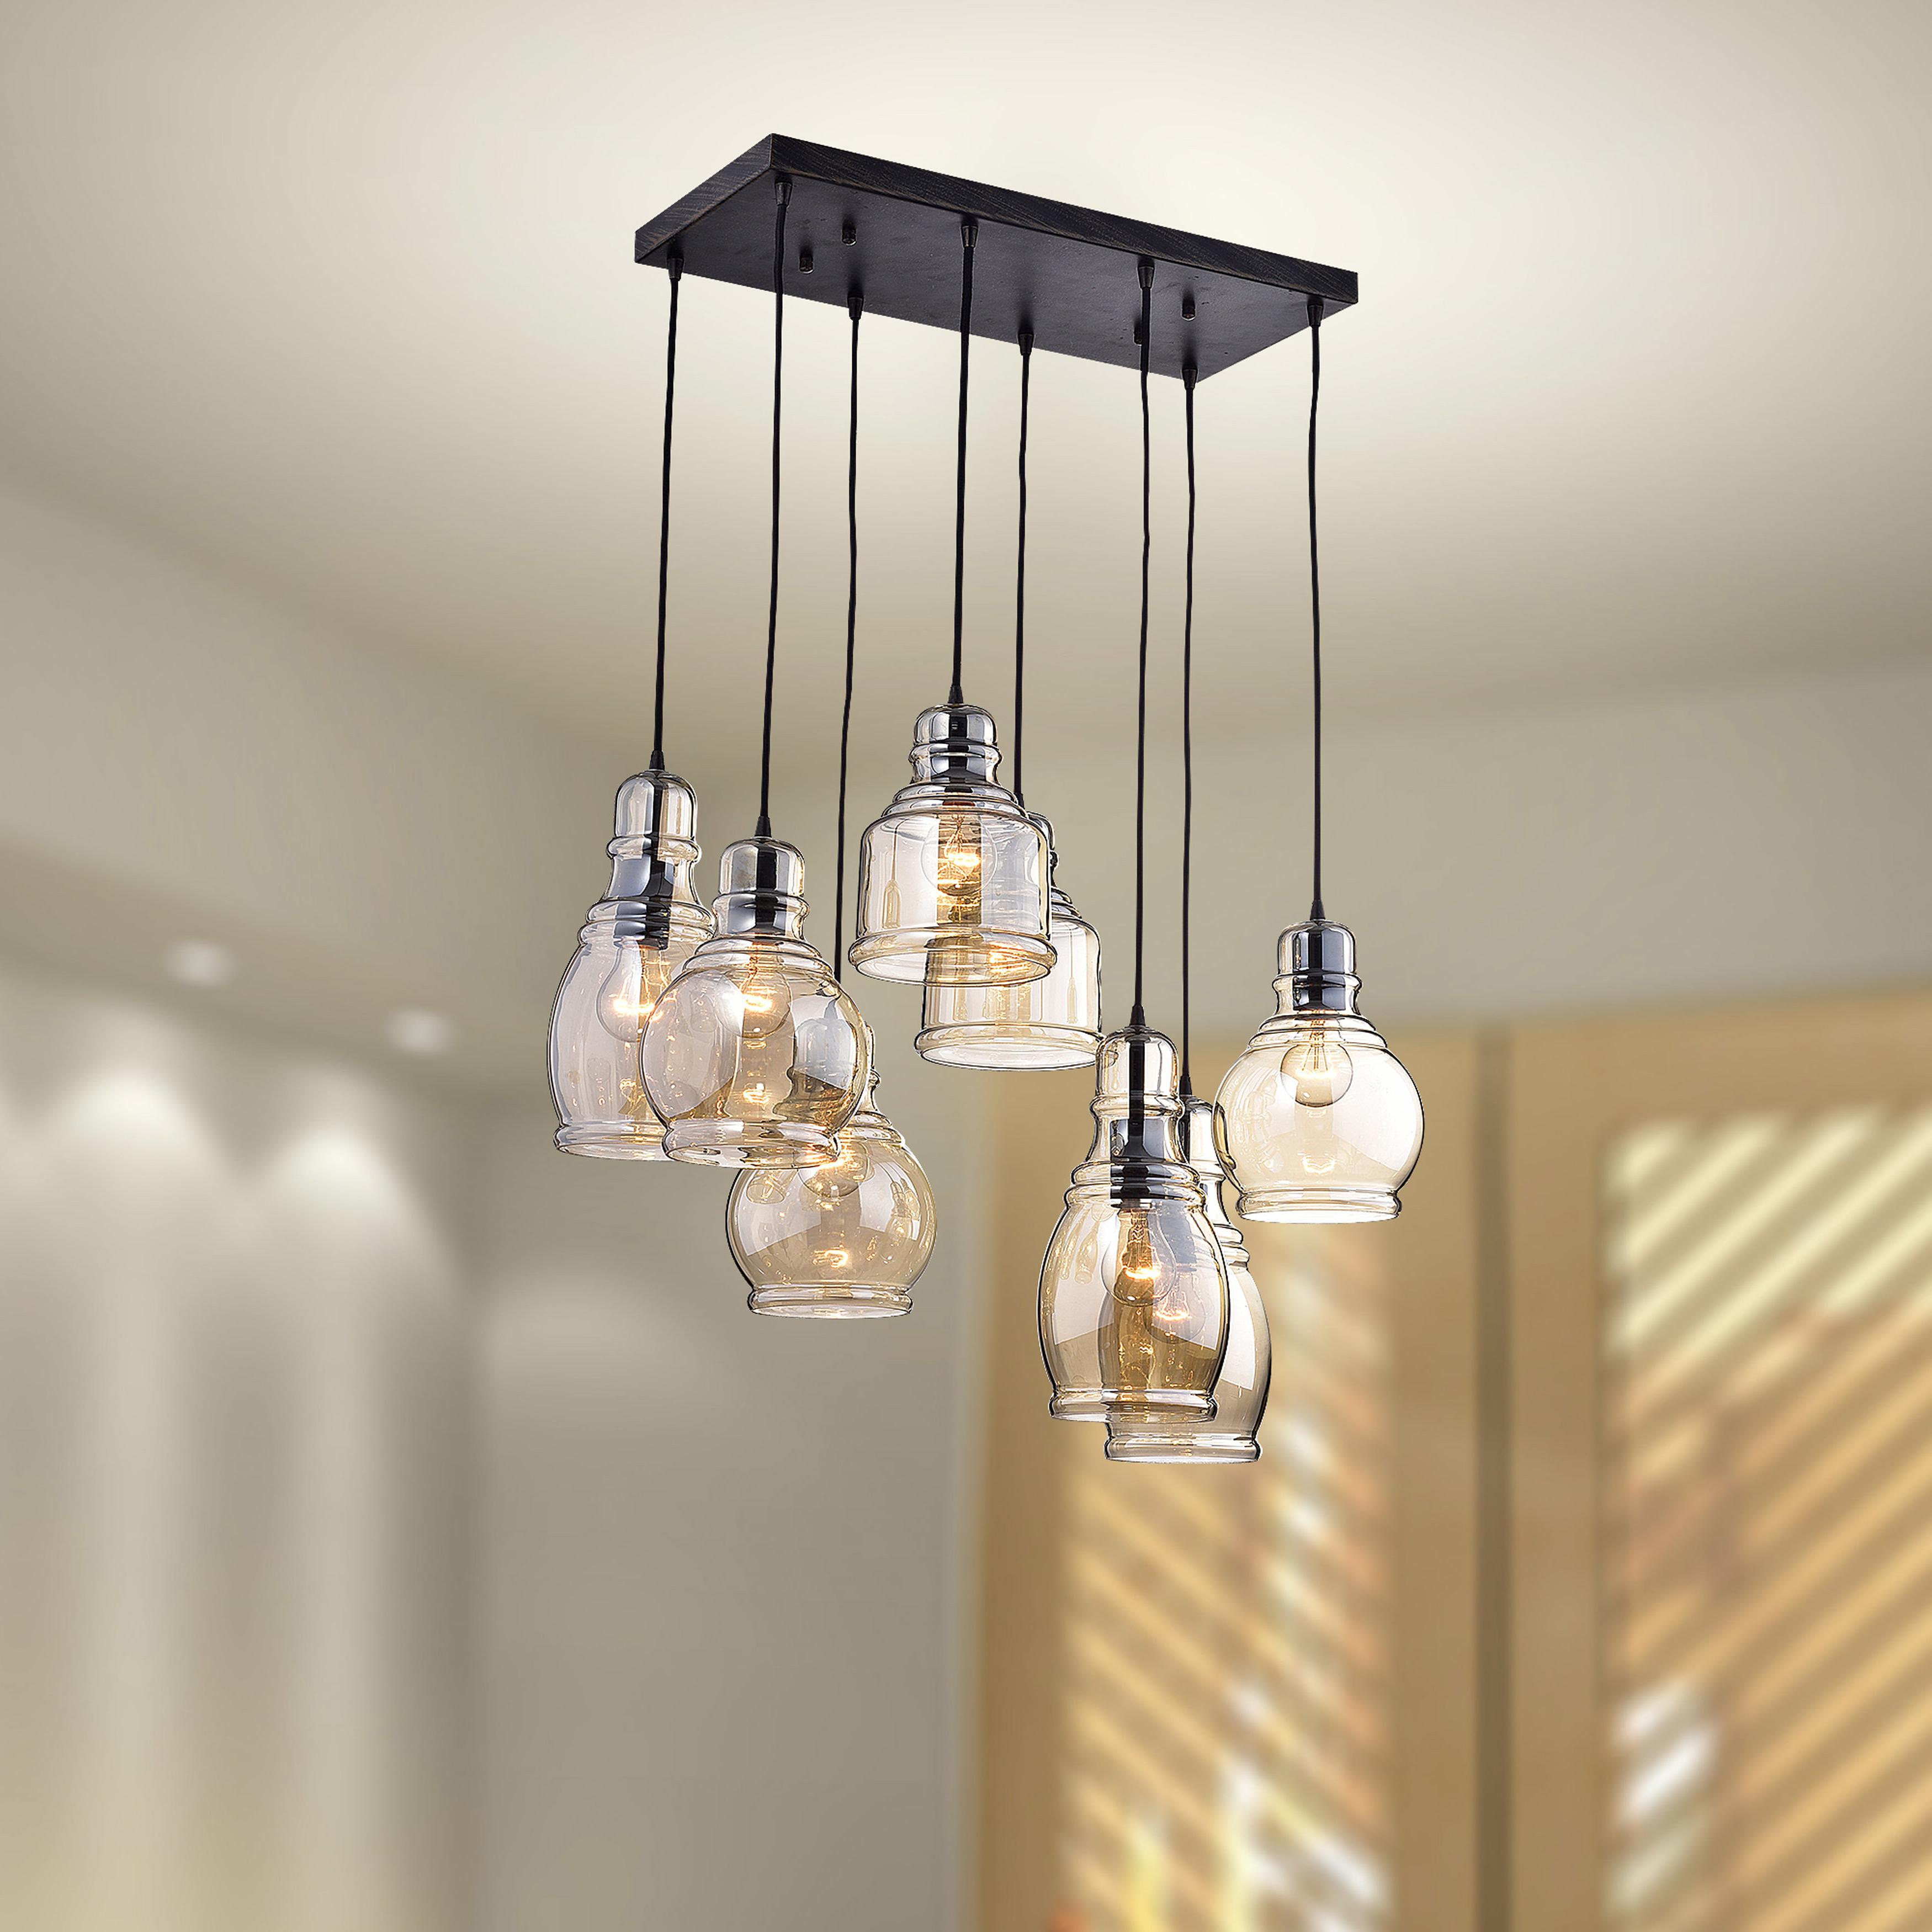 Favorite Vernice 3 Light Cluster Bell Pendants In Pruett Cognac Glass 8 Light Cluster Pendant (View 15 of 20)